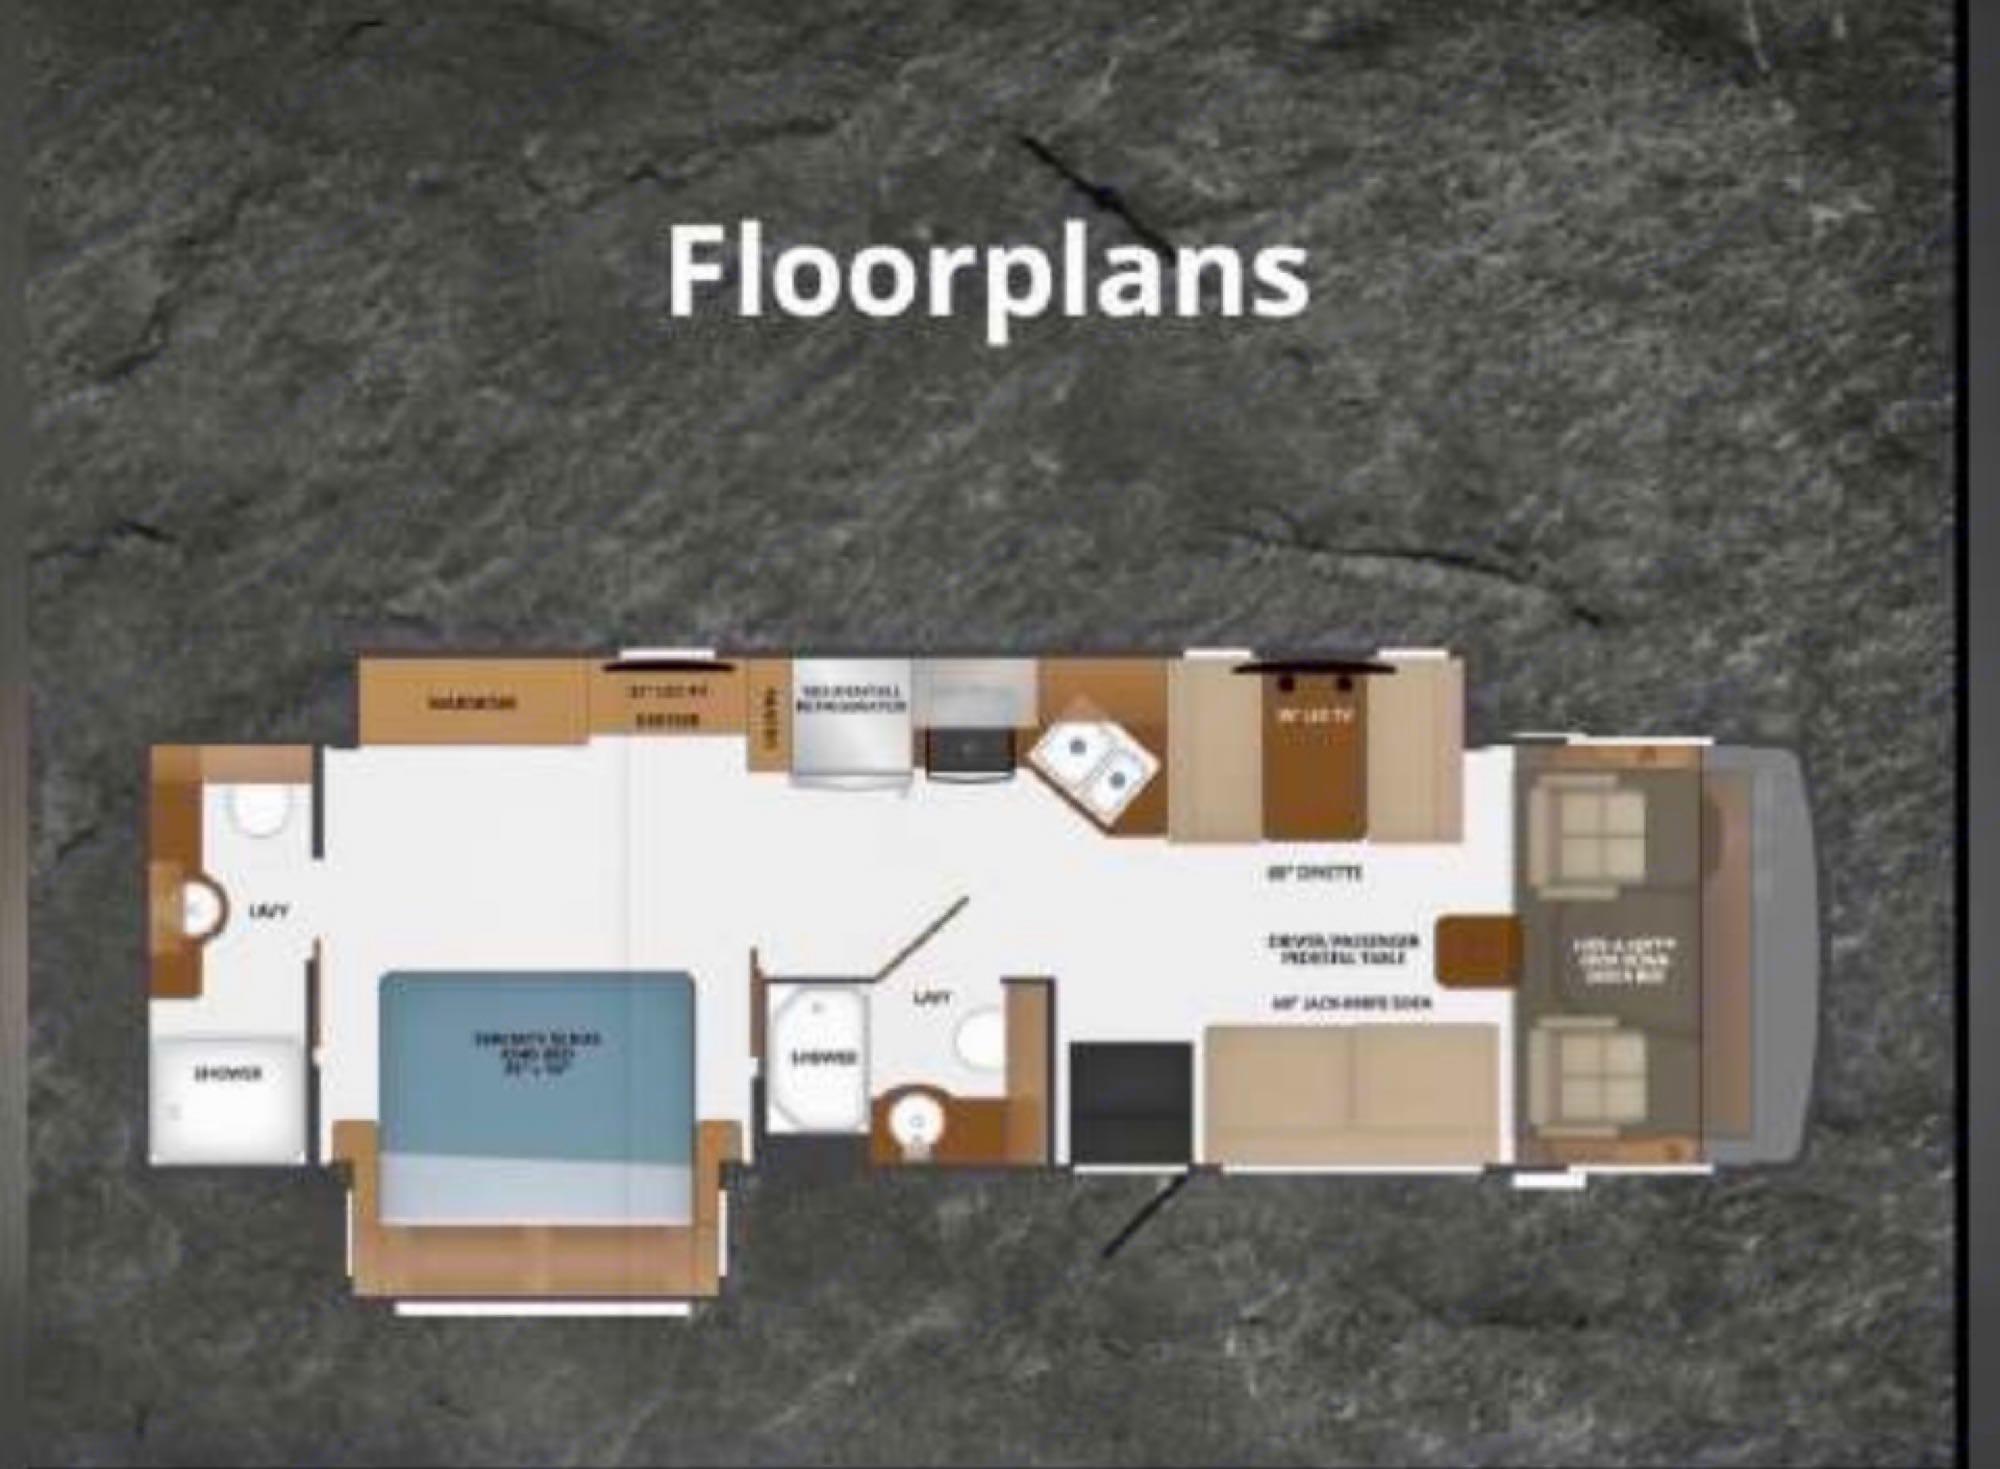 Fleetwood Flair 2020